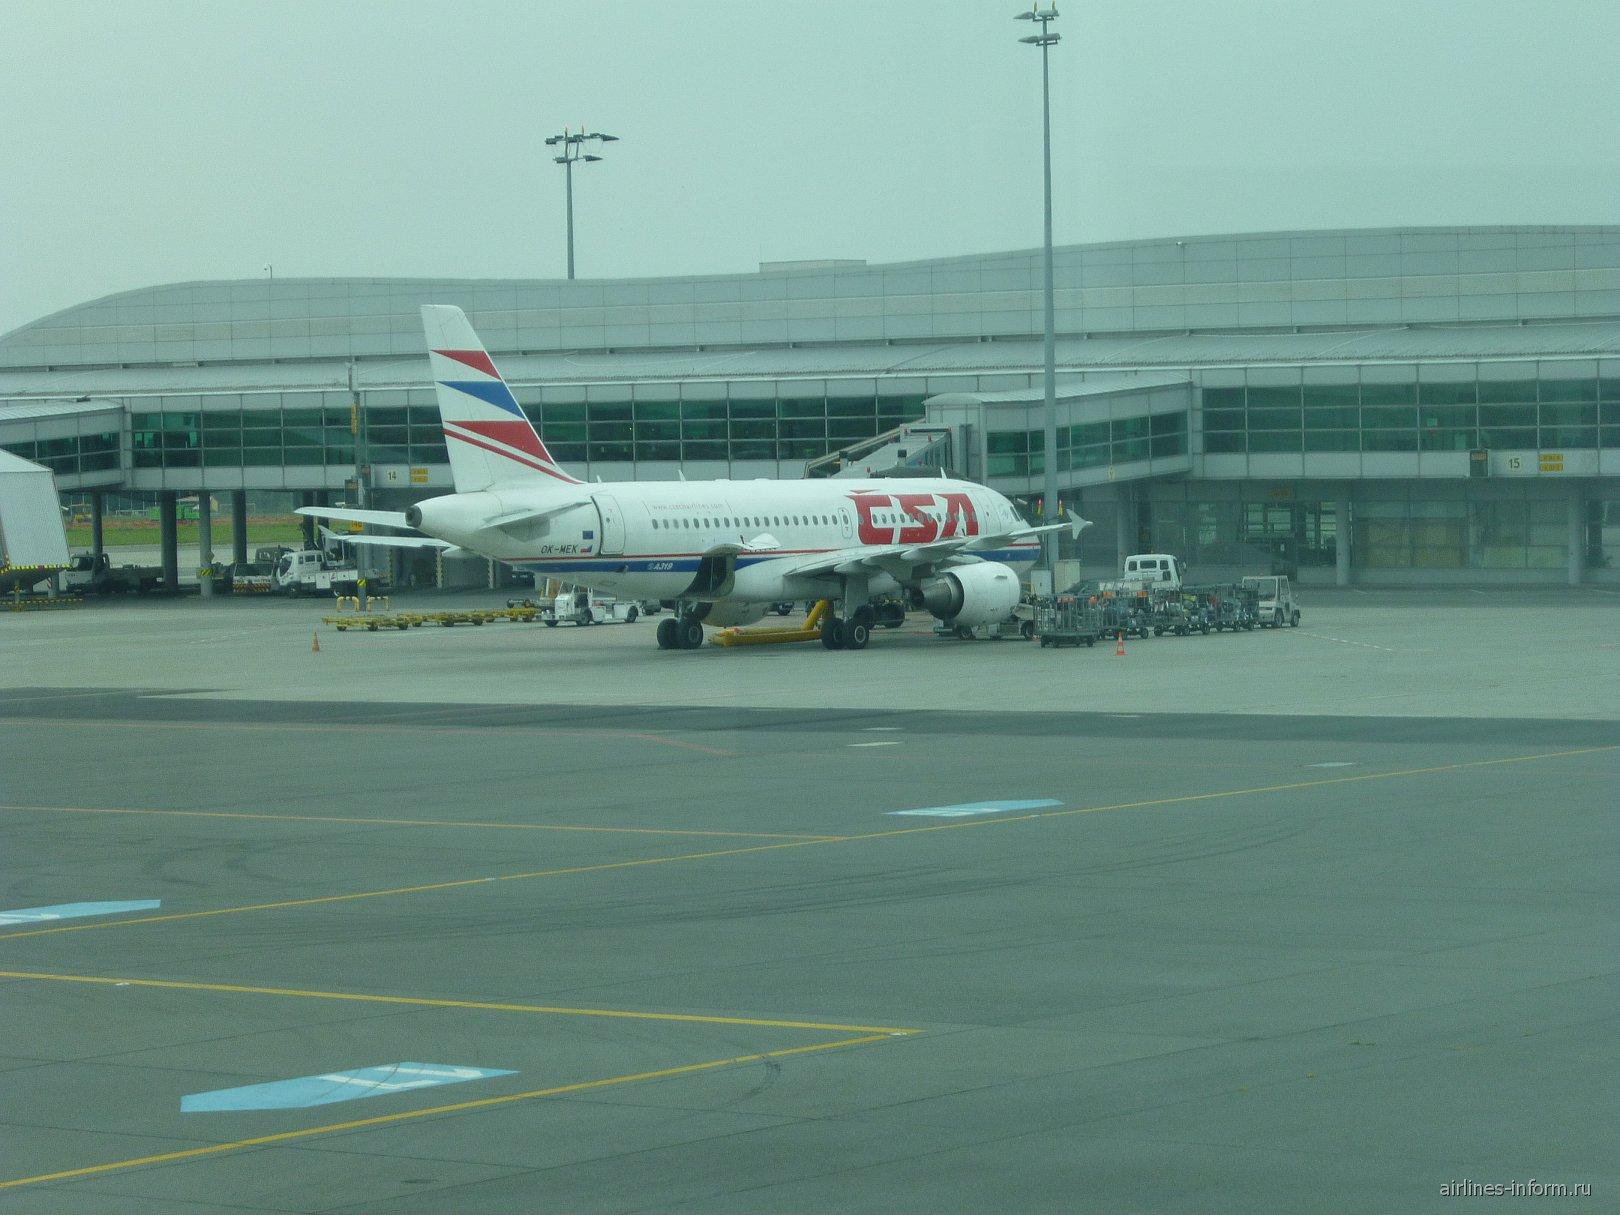 Airbus A319 Чешских авиалиний у Терминала 1 аэропорта Праги